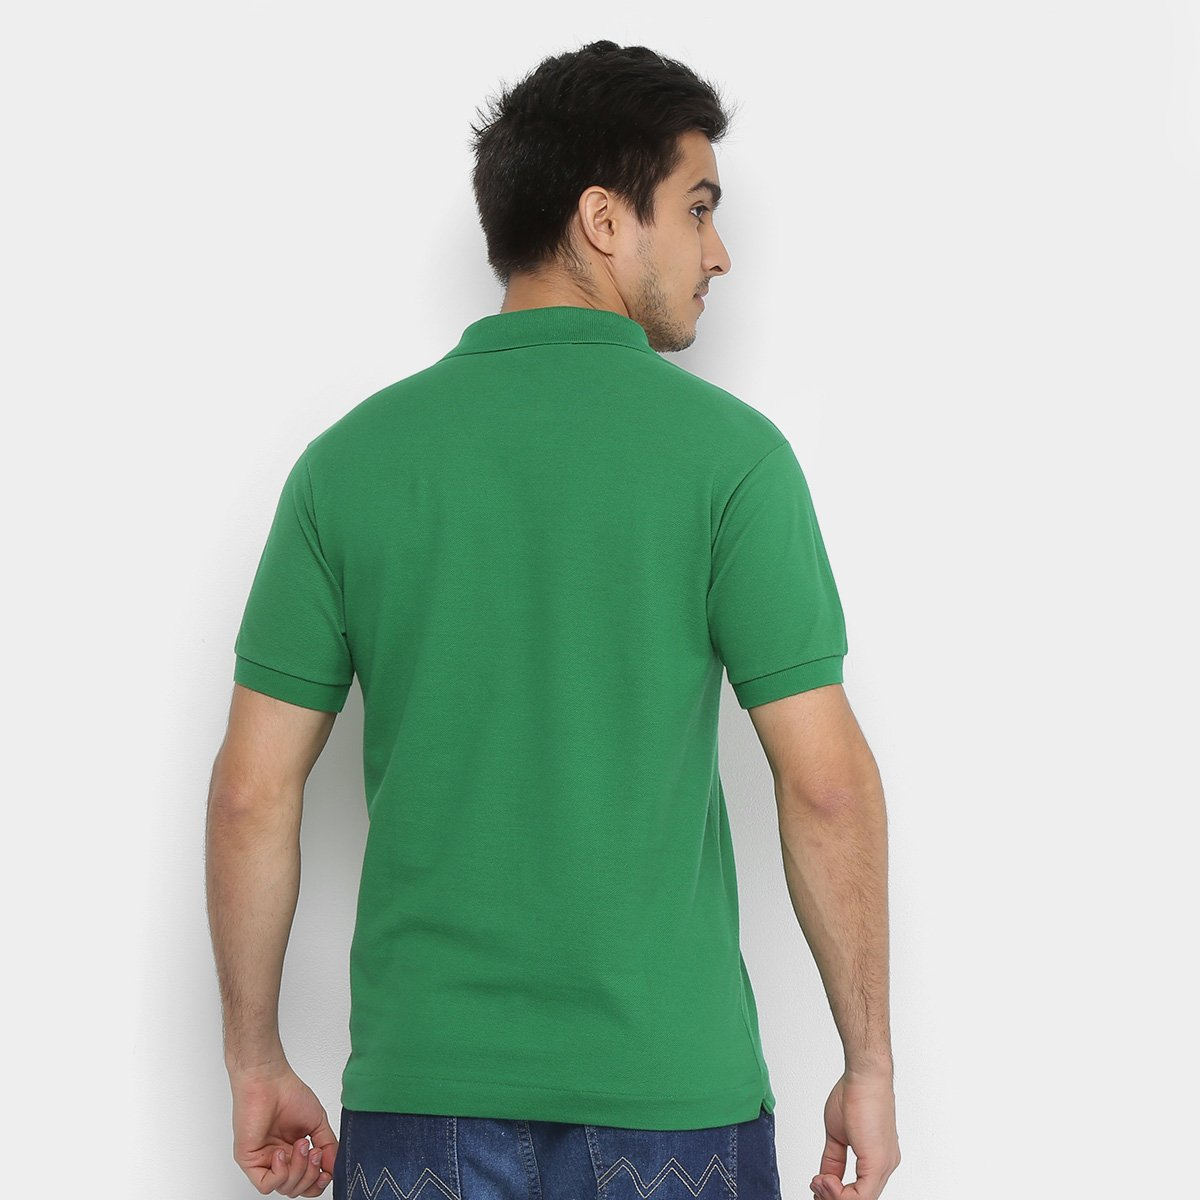 ... Camisa Polo Lacoste Piquet Original Fit Masculina - Verde - Compre . 4e38d4161f